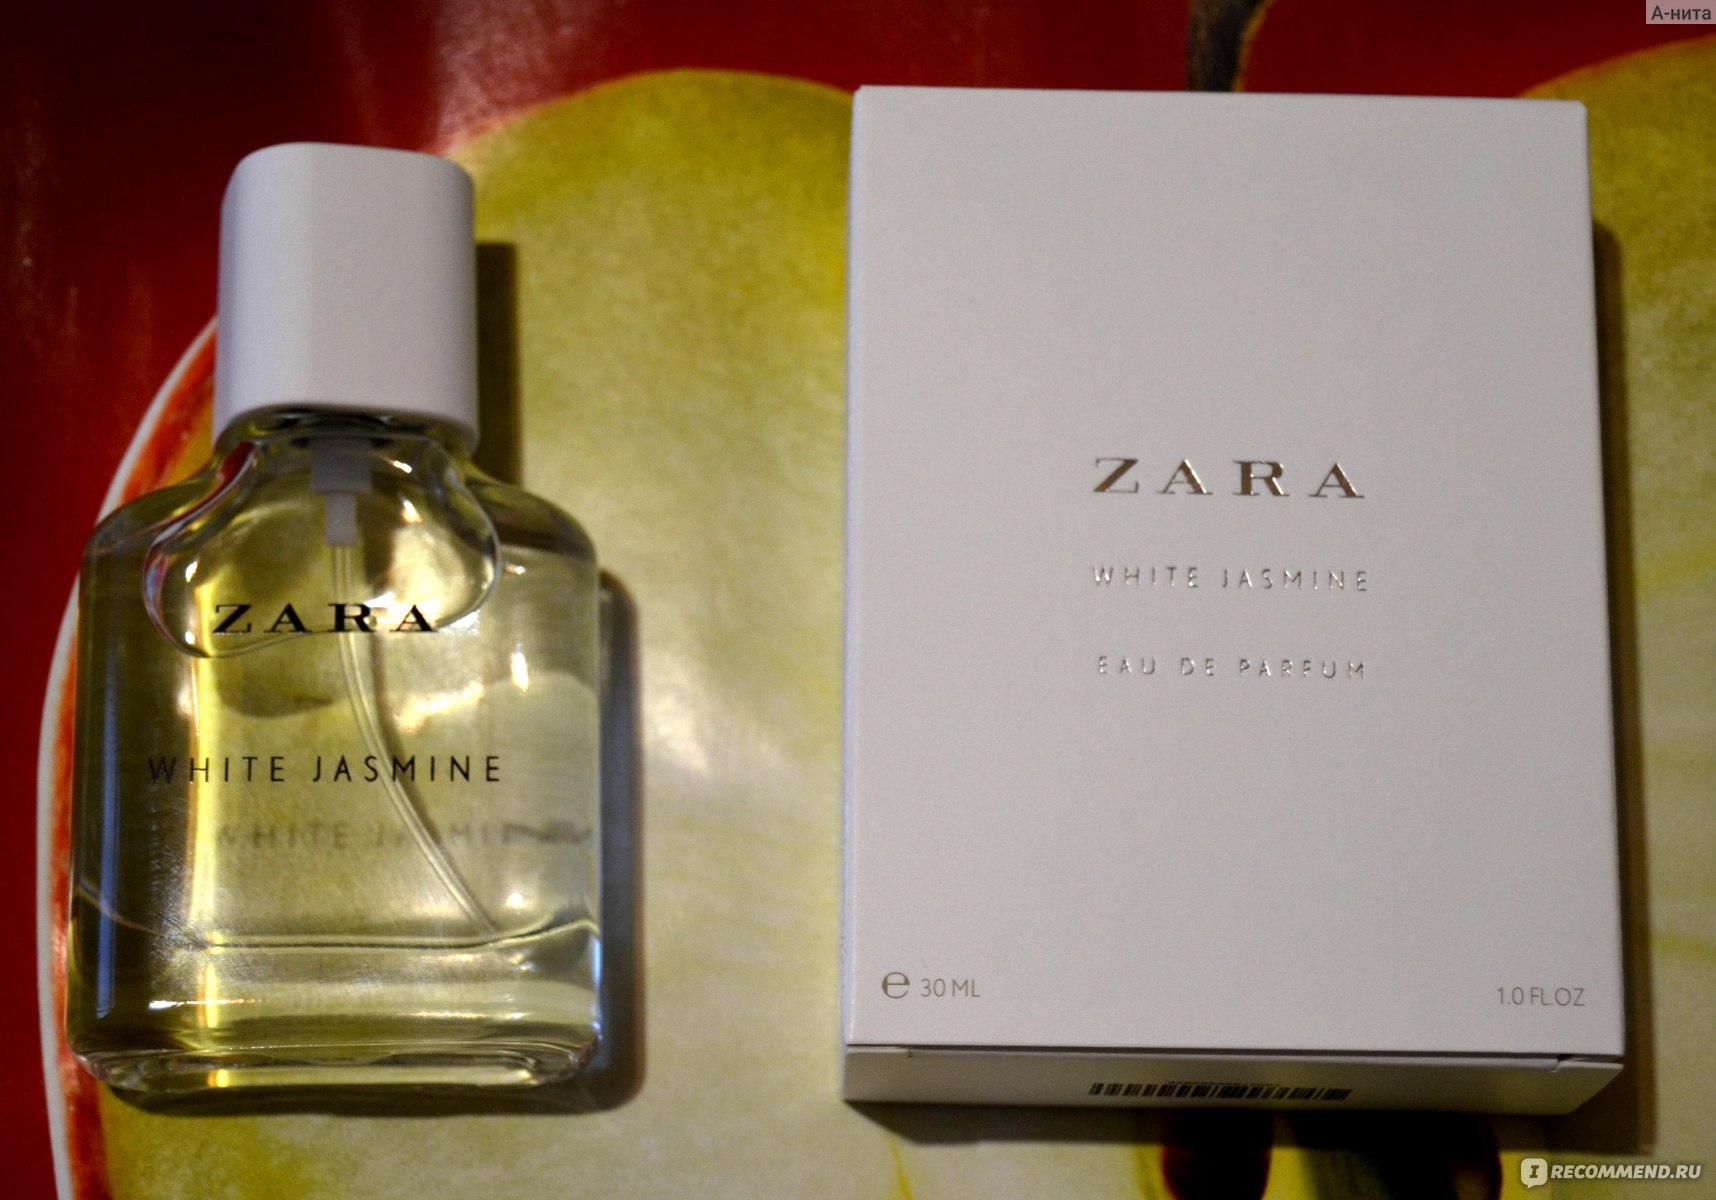 Zara White Jasmine сливочно пудровый жасмин отзывы покупателей